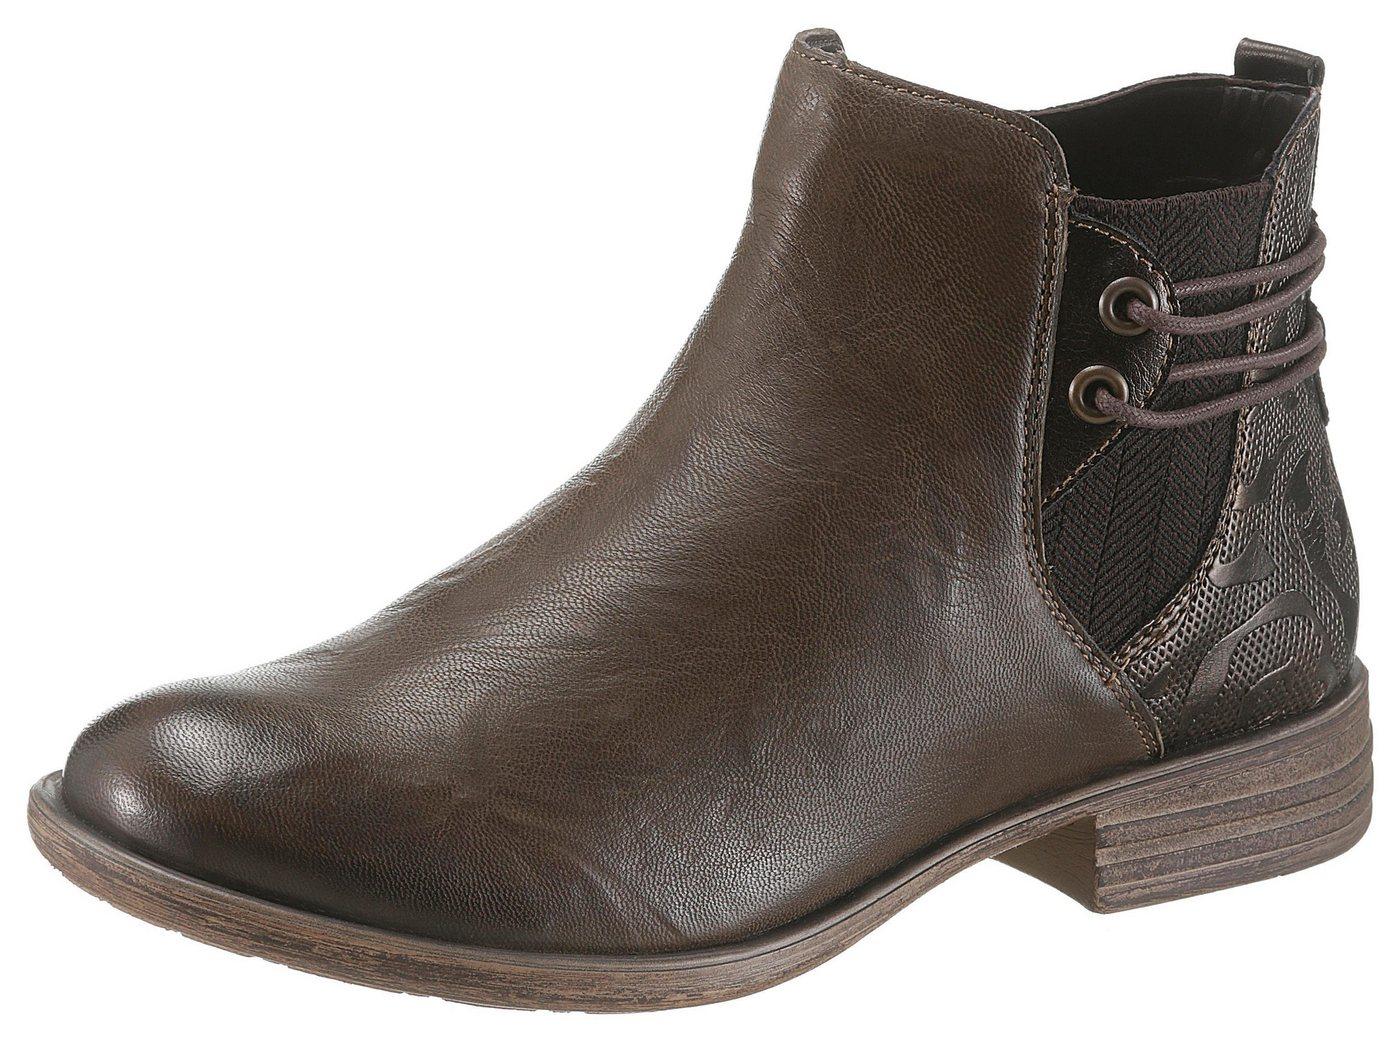 Remonte Chelseaboots mit Prägung | Schuhe > Boots > Chelsea-Boots | Grün | Leder | Remonte